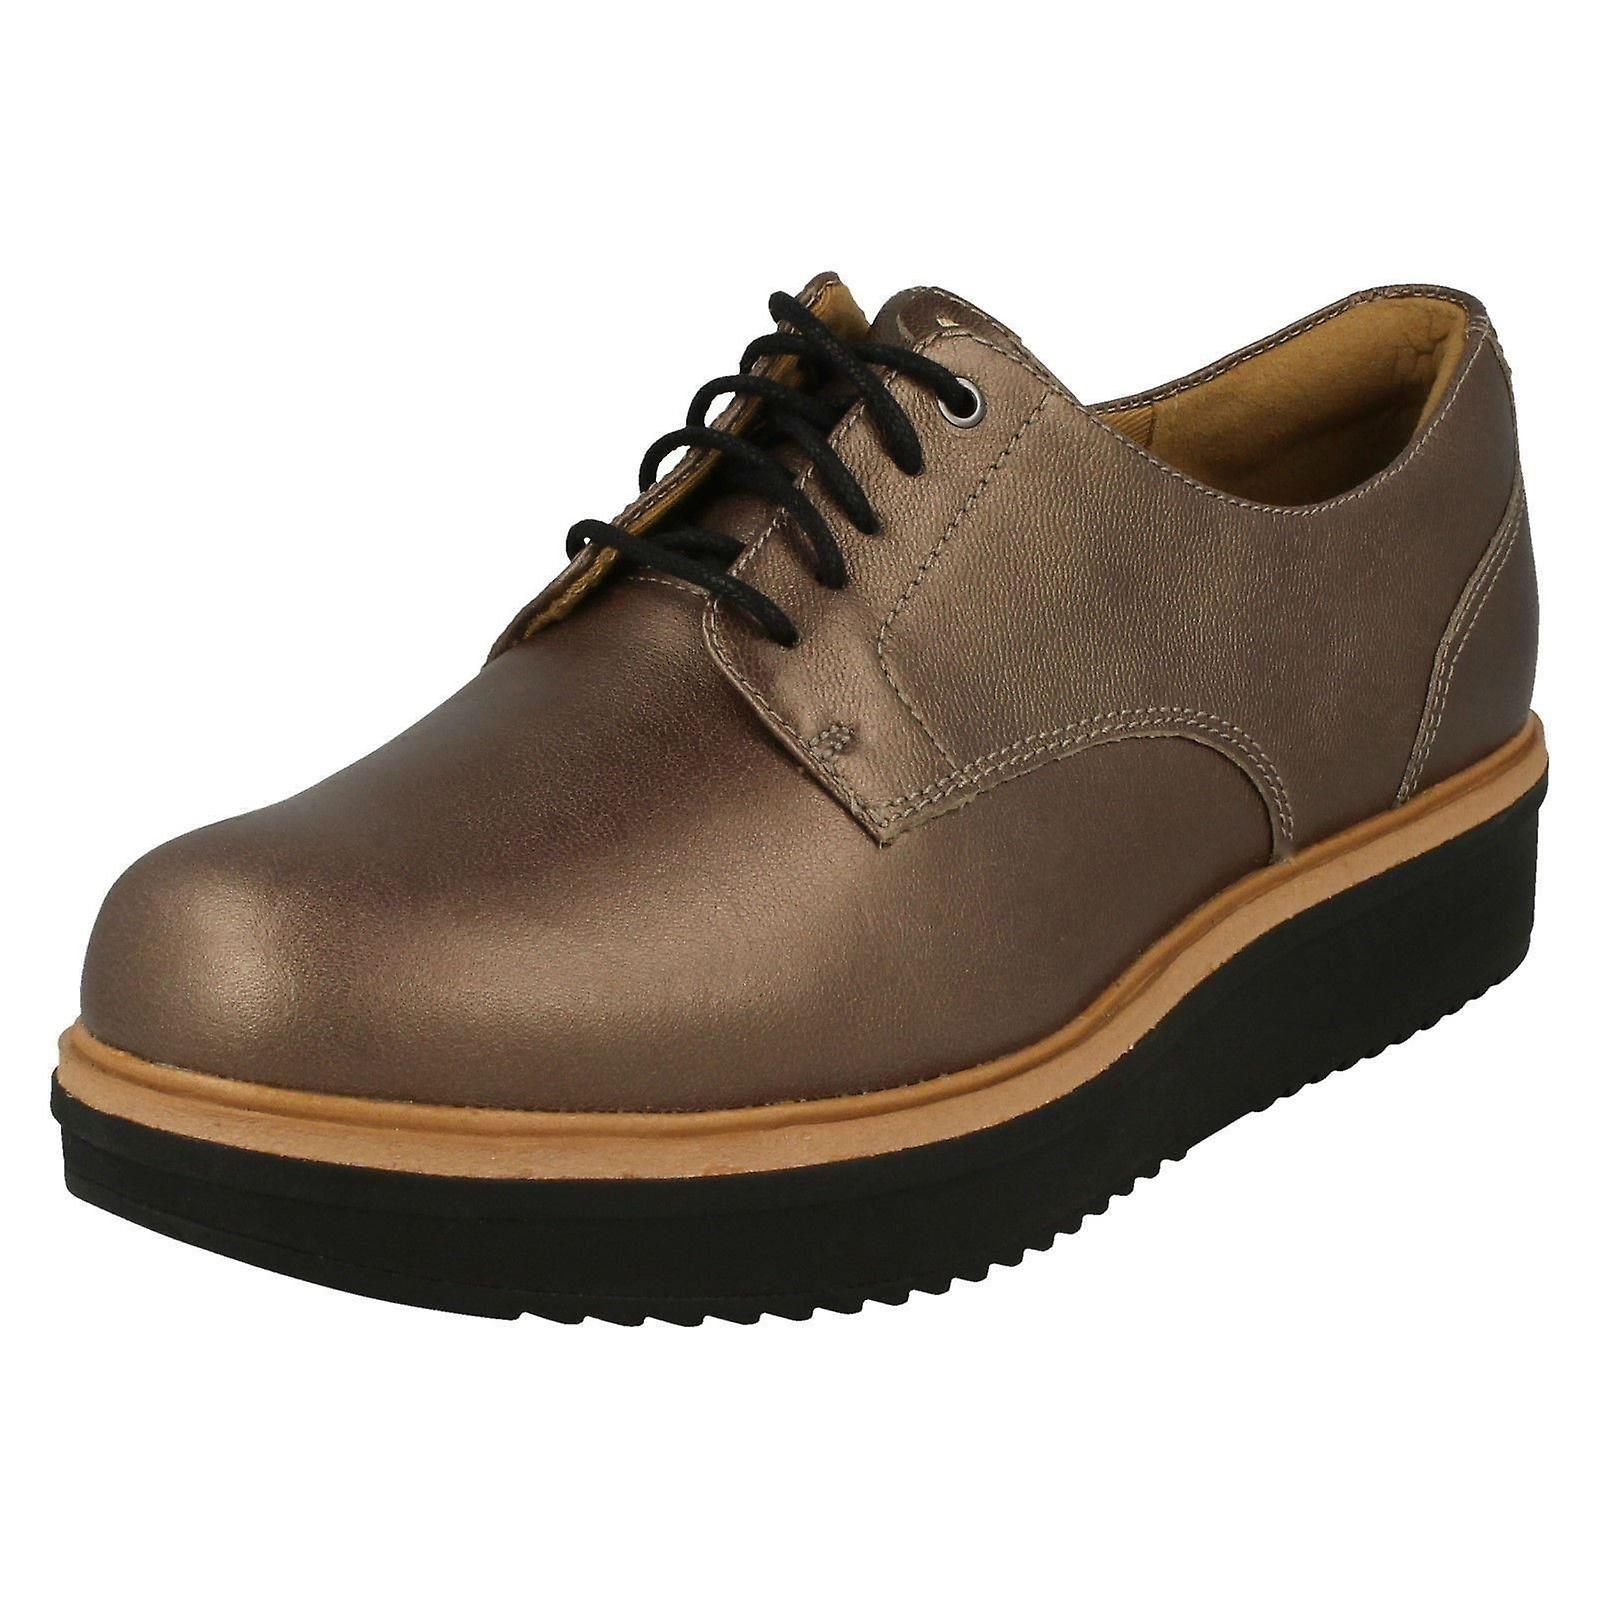 Brogue 5M Size UK 6D 39 Clarks 8 Leather Rhea Size Ladies Shoes 5 US EU Size Style Pewter Teadale 5Fqx77Uw